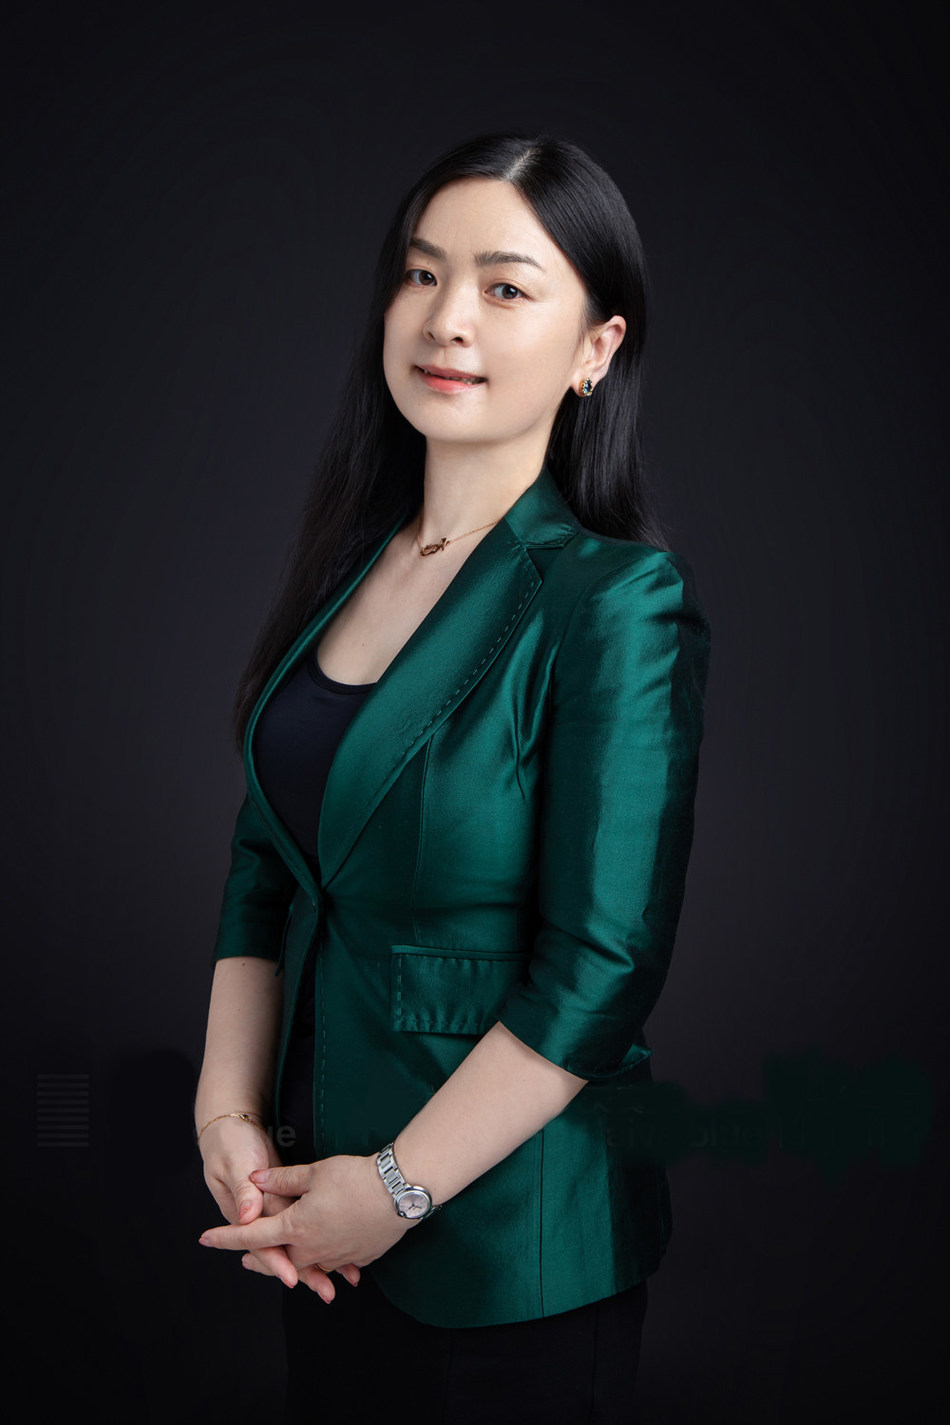 Ms. Wendy Wang, CEO of SIMCom Wireless Solutions Co., Ltd. (PRNewsfoto/SIMCom)